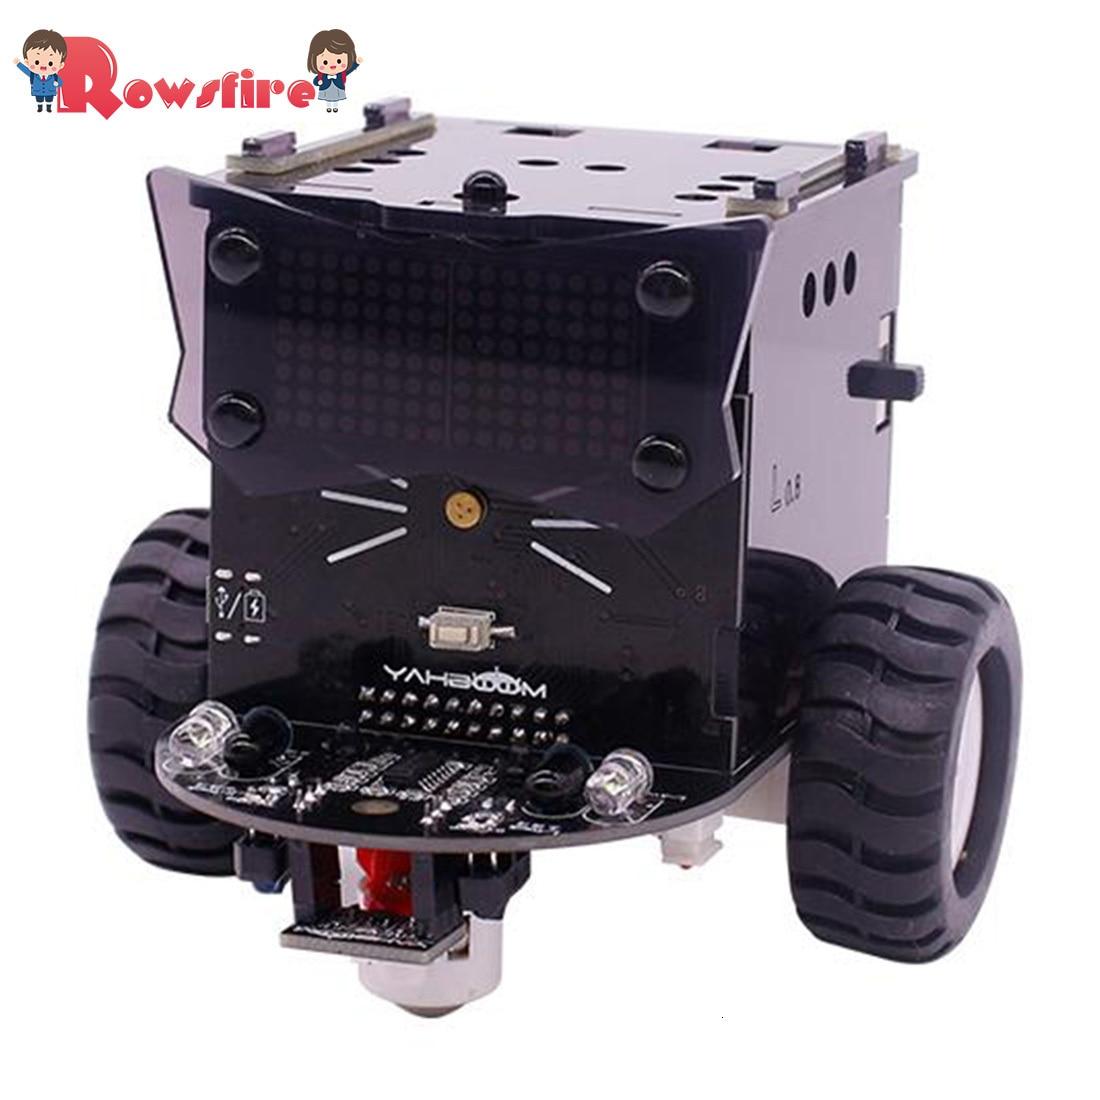 High Recommend 1 Set Standard Version Omibox Scratch Programmable Robot Car Kit